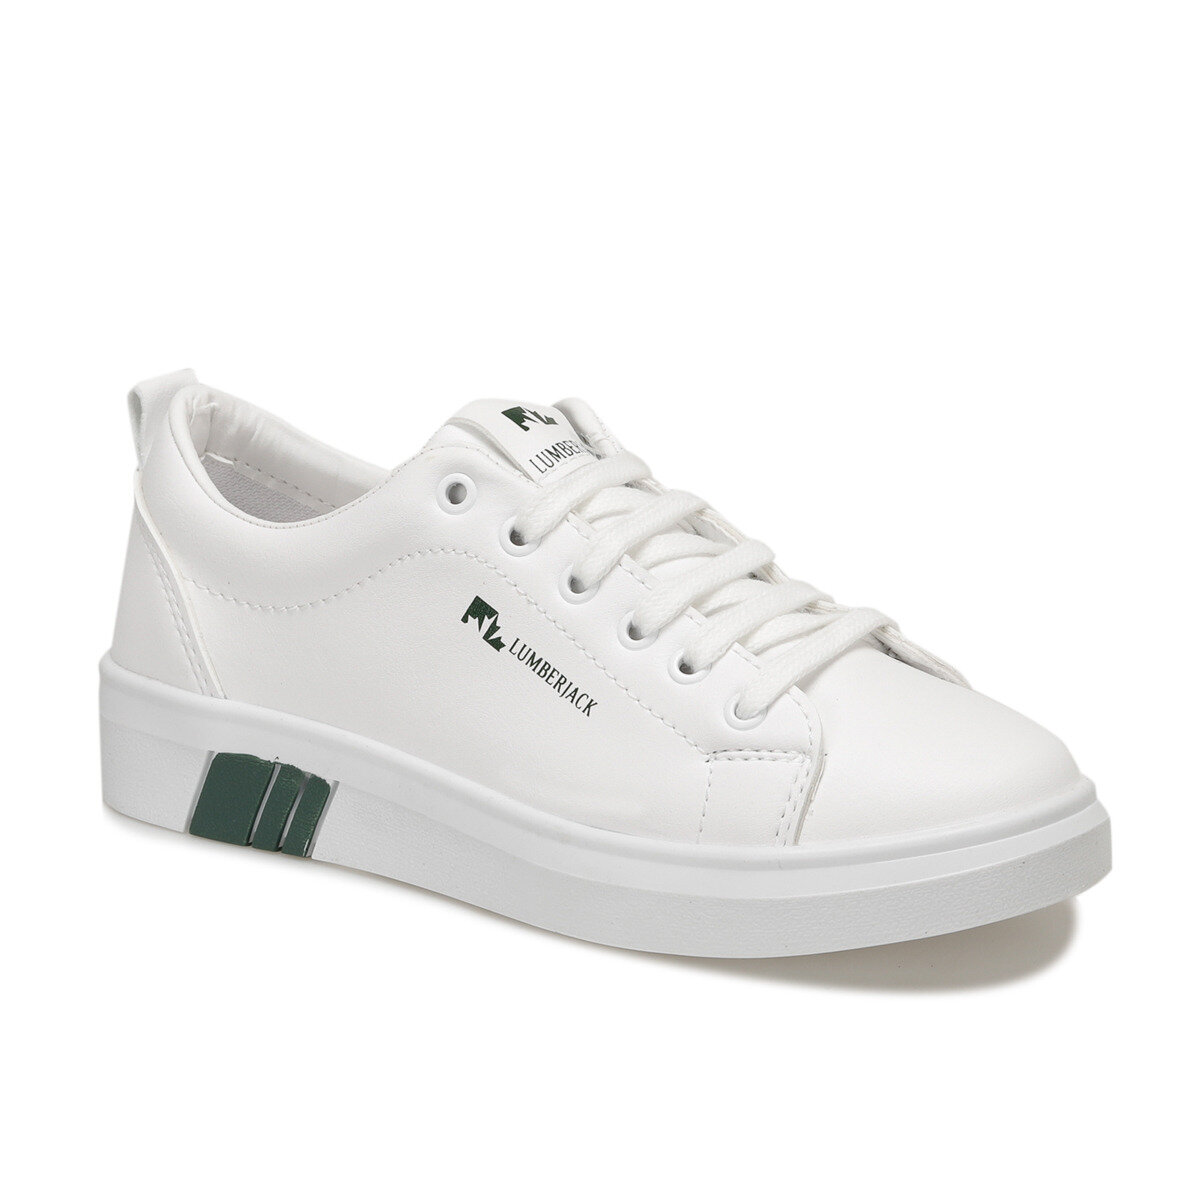 FLO TINA Black Women 'S Sneaker Shoes LUMBERJACK